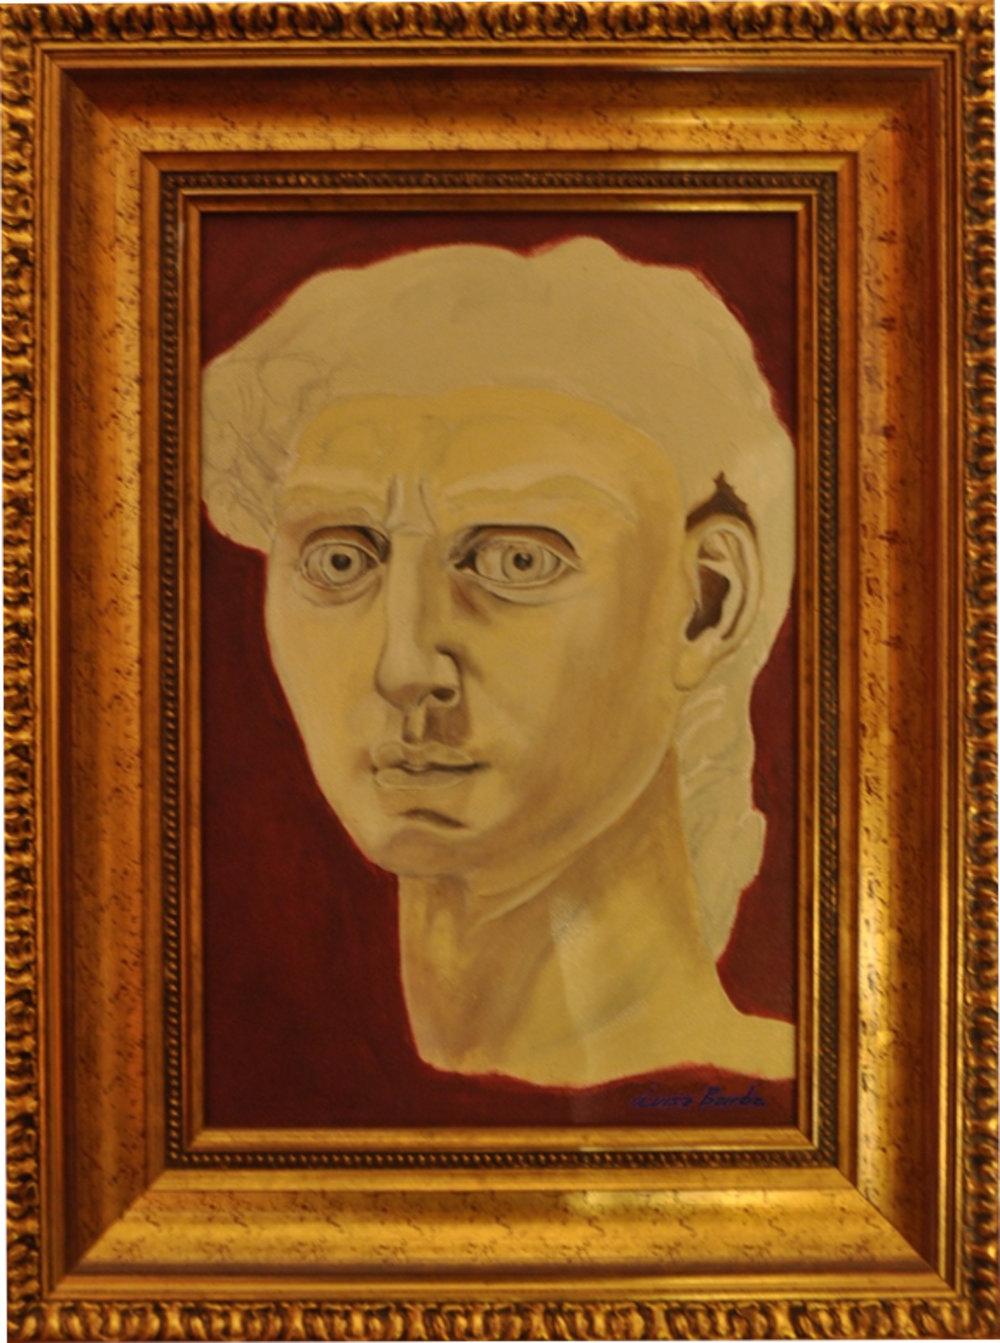 """David"" Acrilyc on canvas. Size without frame 28 x 68cm"